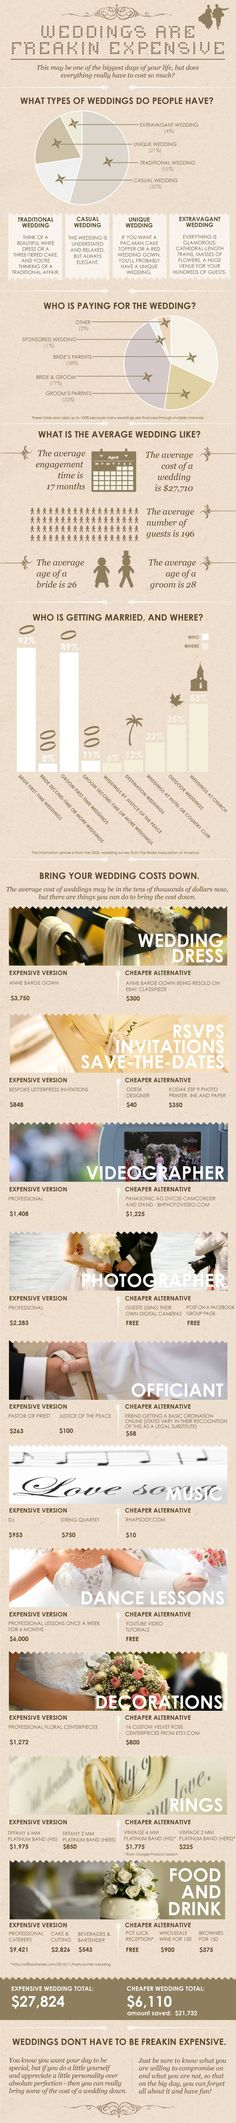 Pinned Image on expensive versus cheaper weddings